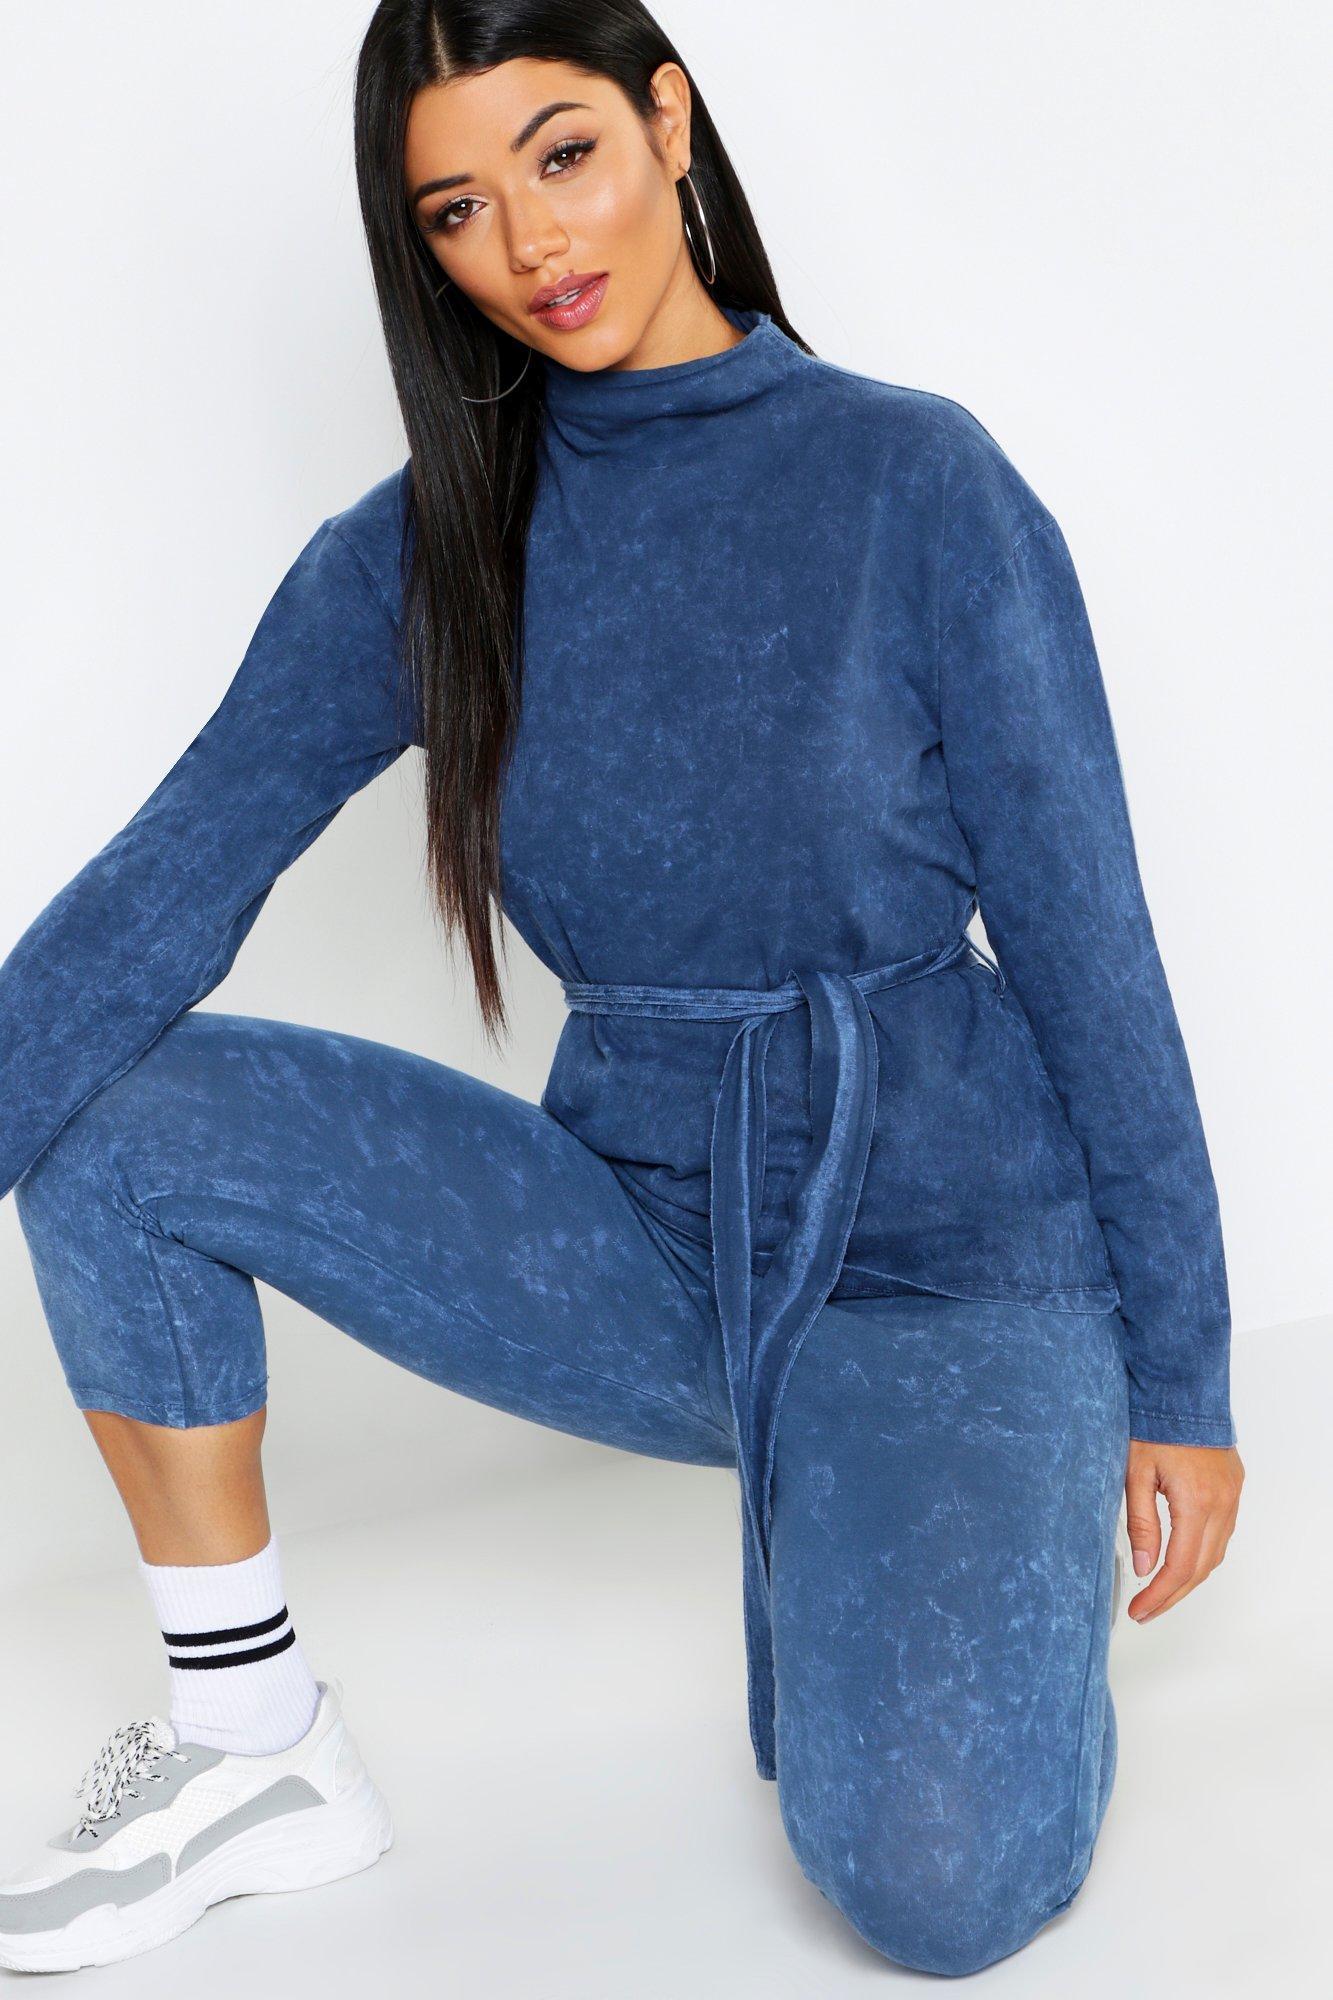 Womens langärmeliges T-Shirt mit Taillenbindung - Blau - 36, Blau - Boohoo.com